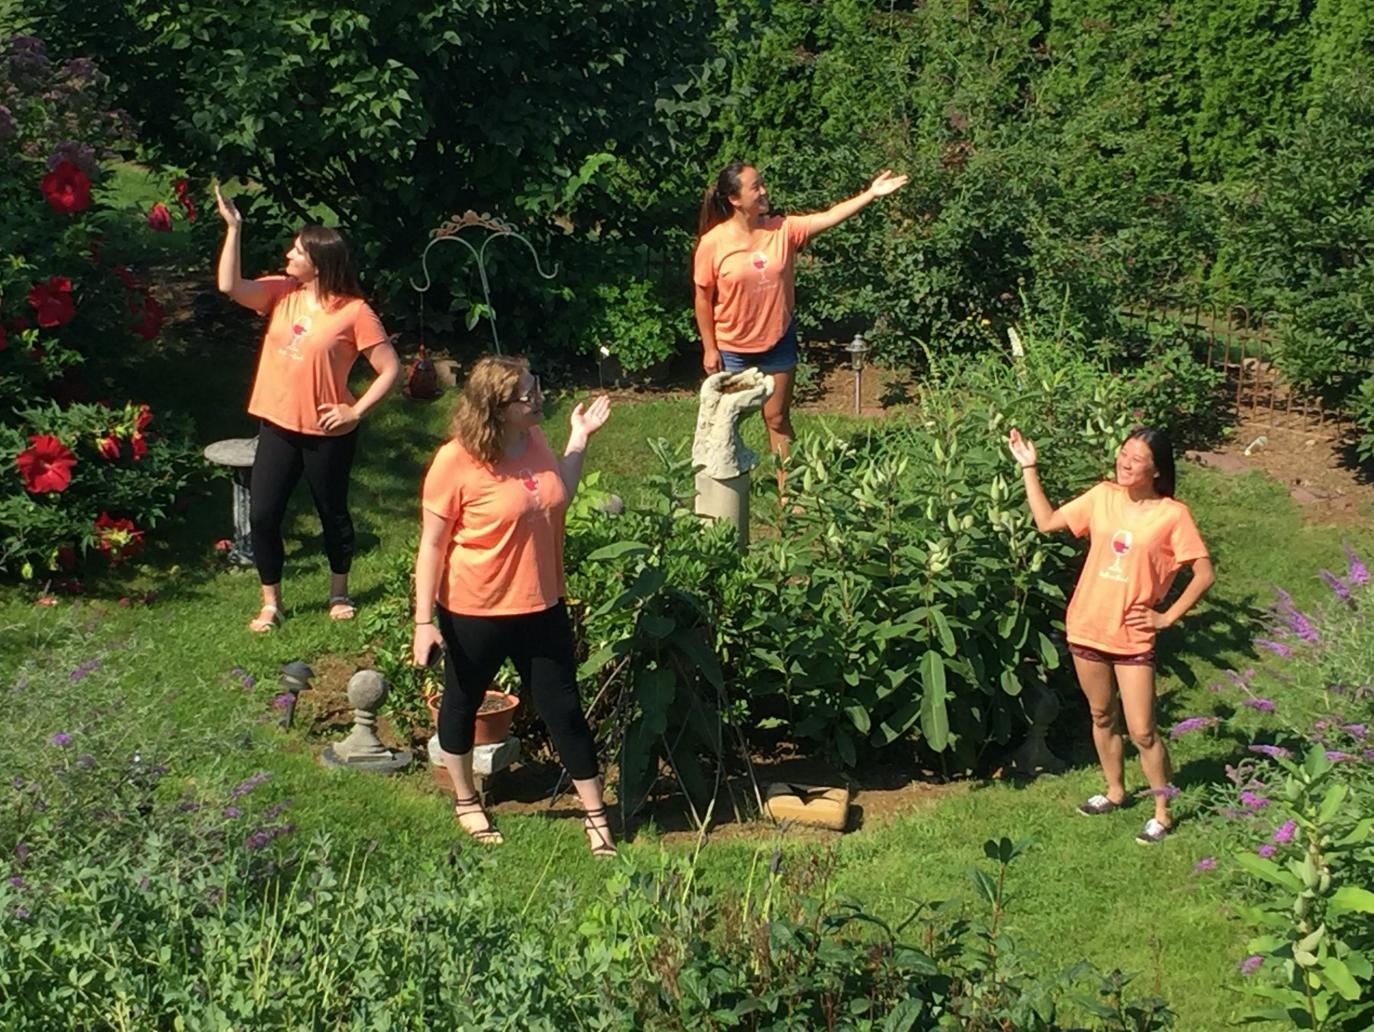 Group of four young ladies in statue garden enjoying friends' retreat. Wearing matching orange tee shirts.